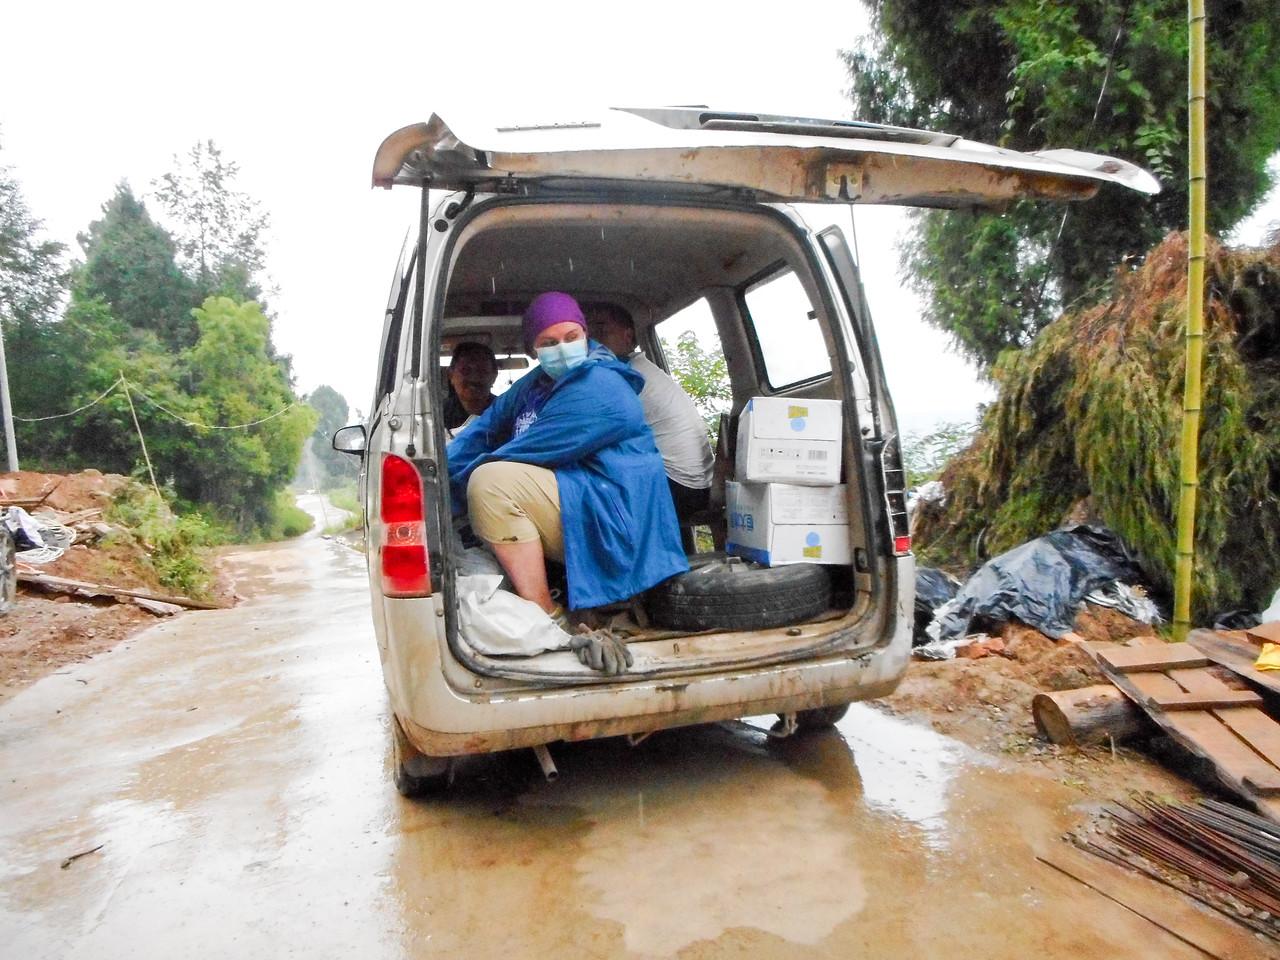 shelter from the rain in the brickmason's  van